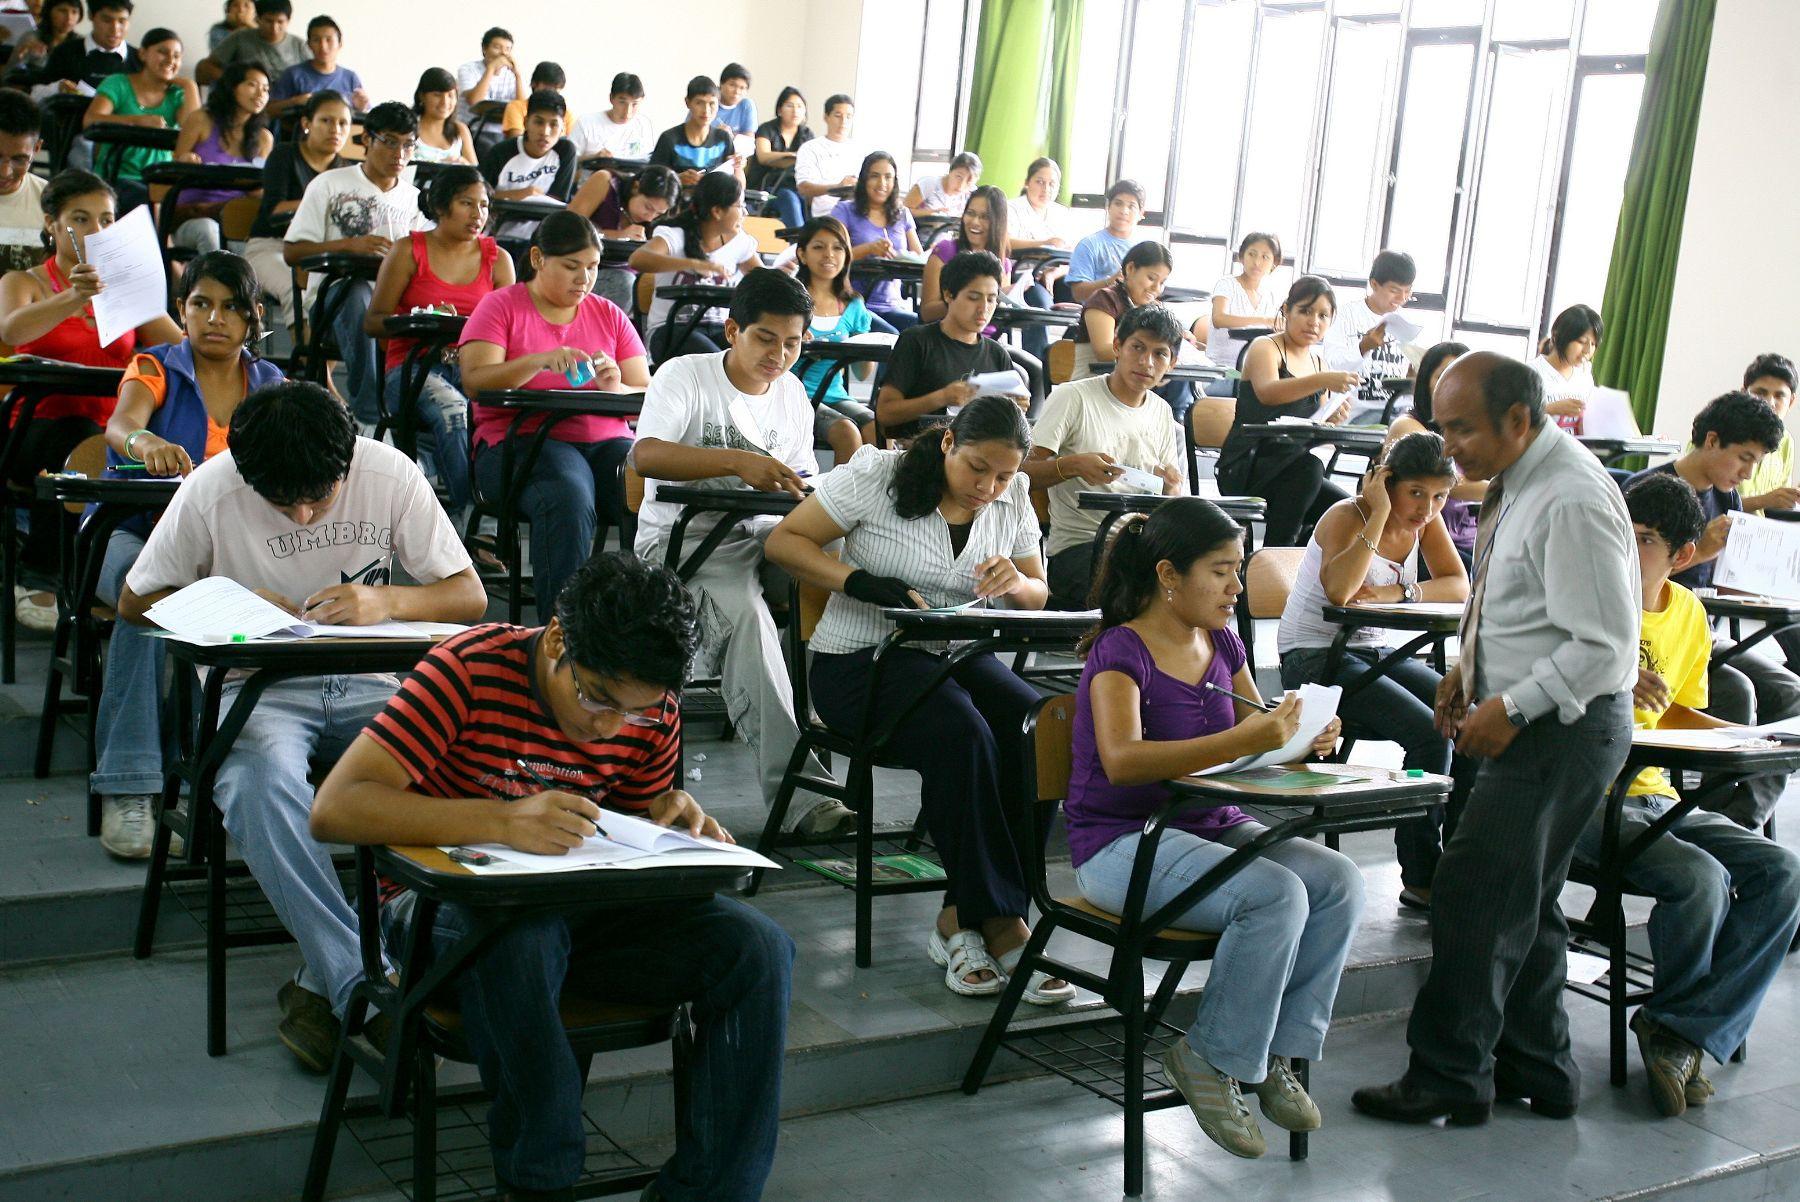 minedu-universidades-e-institutos-funcionarian-bajo-modalidad-semipresencial-este-ano